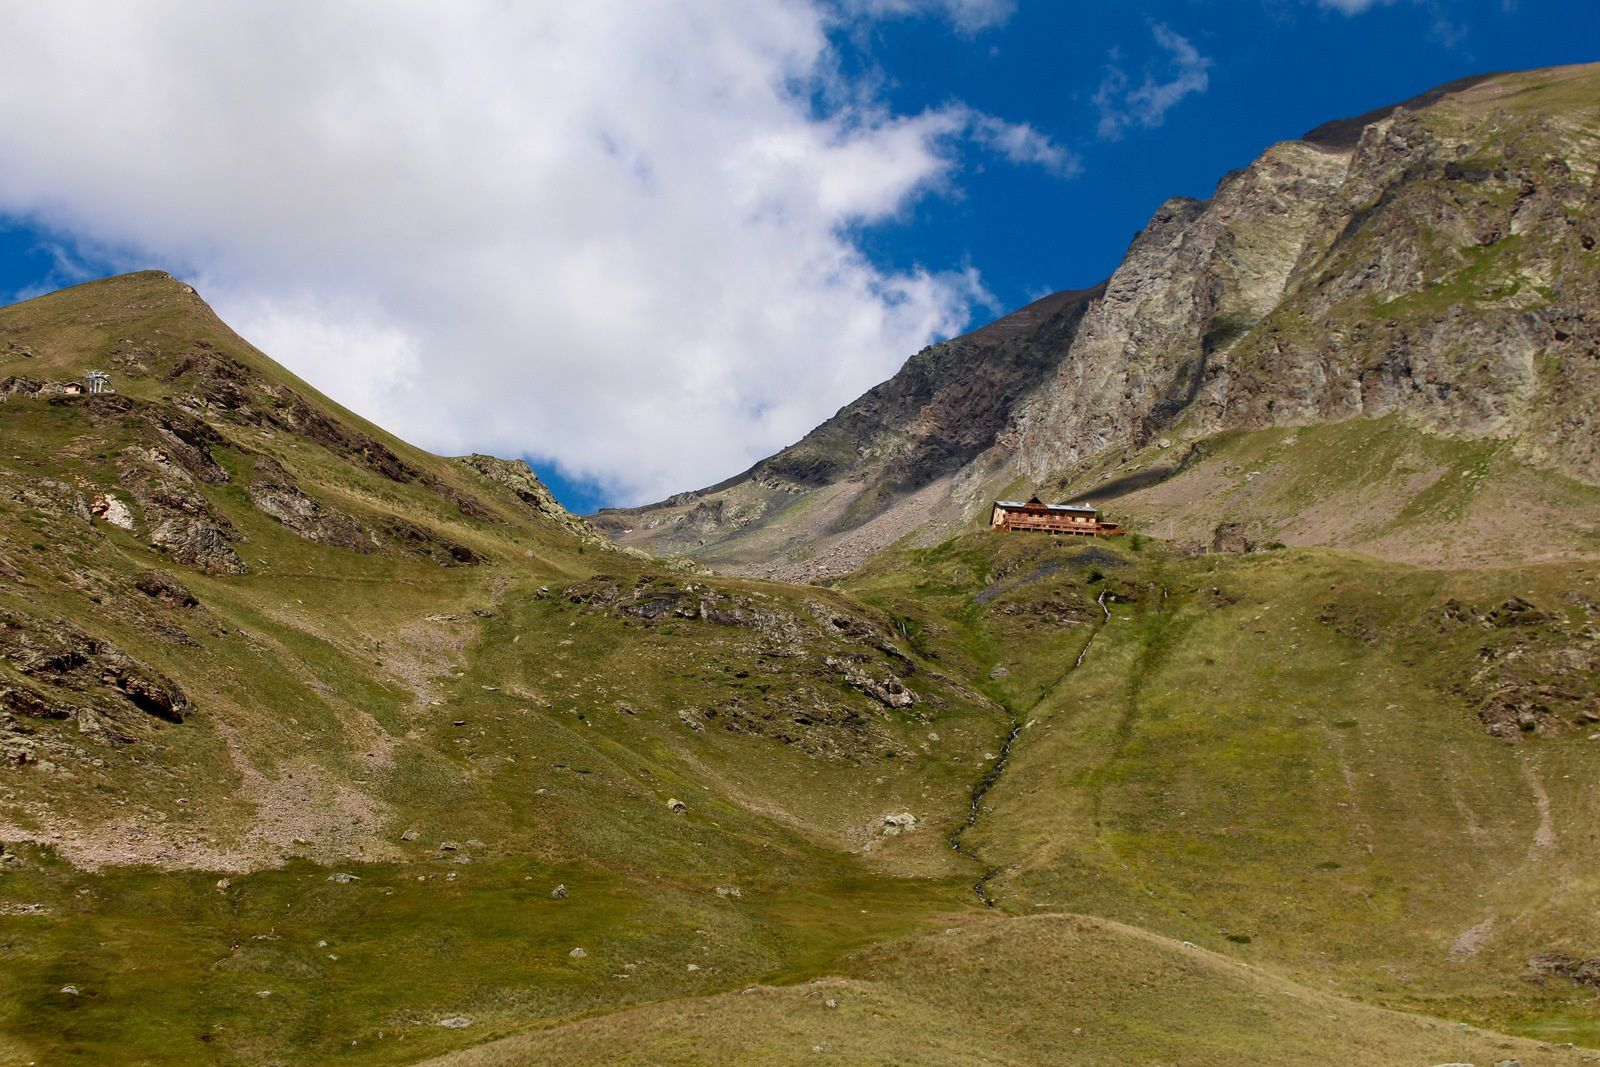 Randonner en montagne (et en famille)